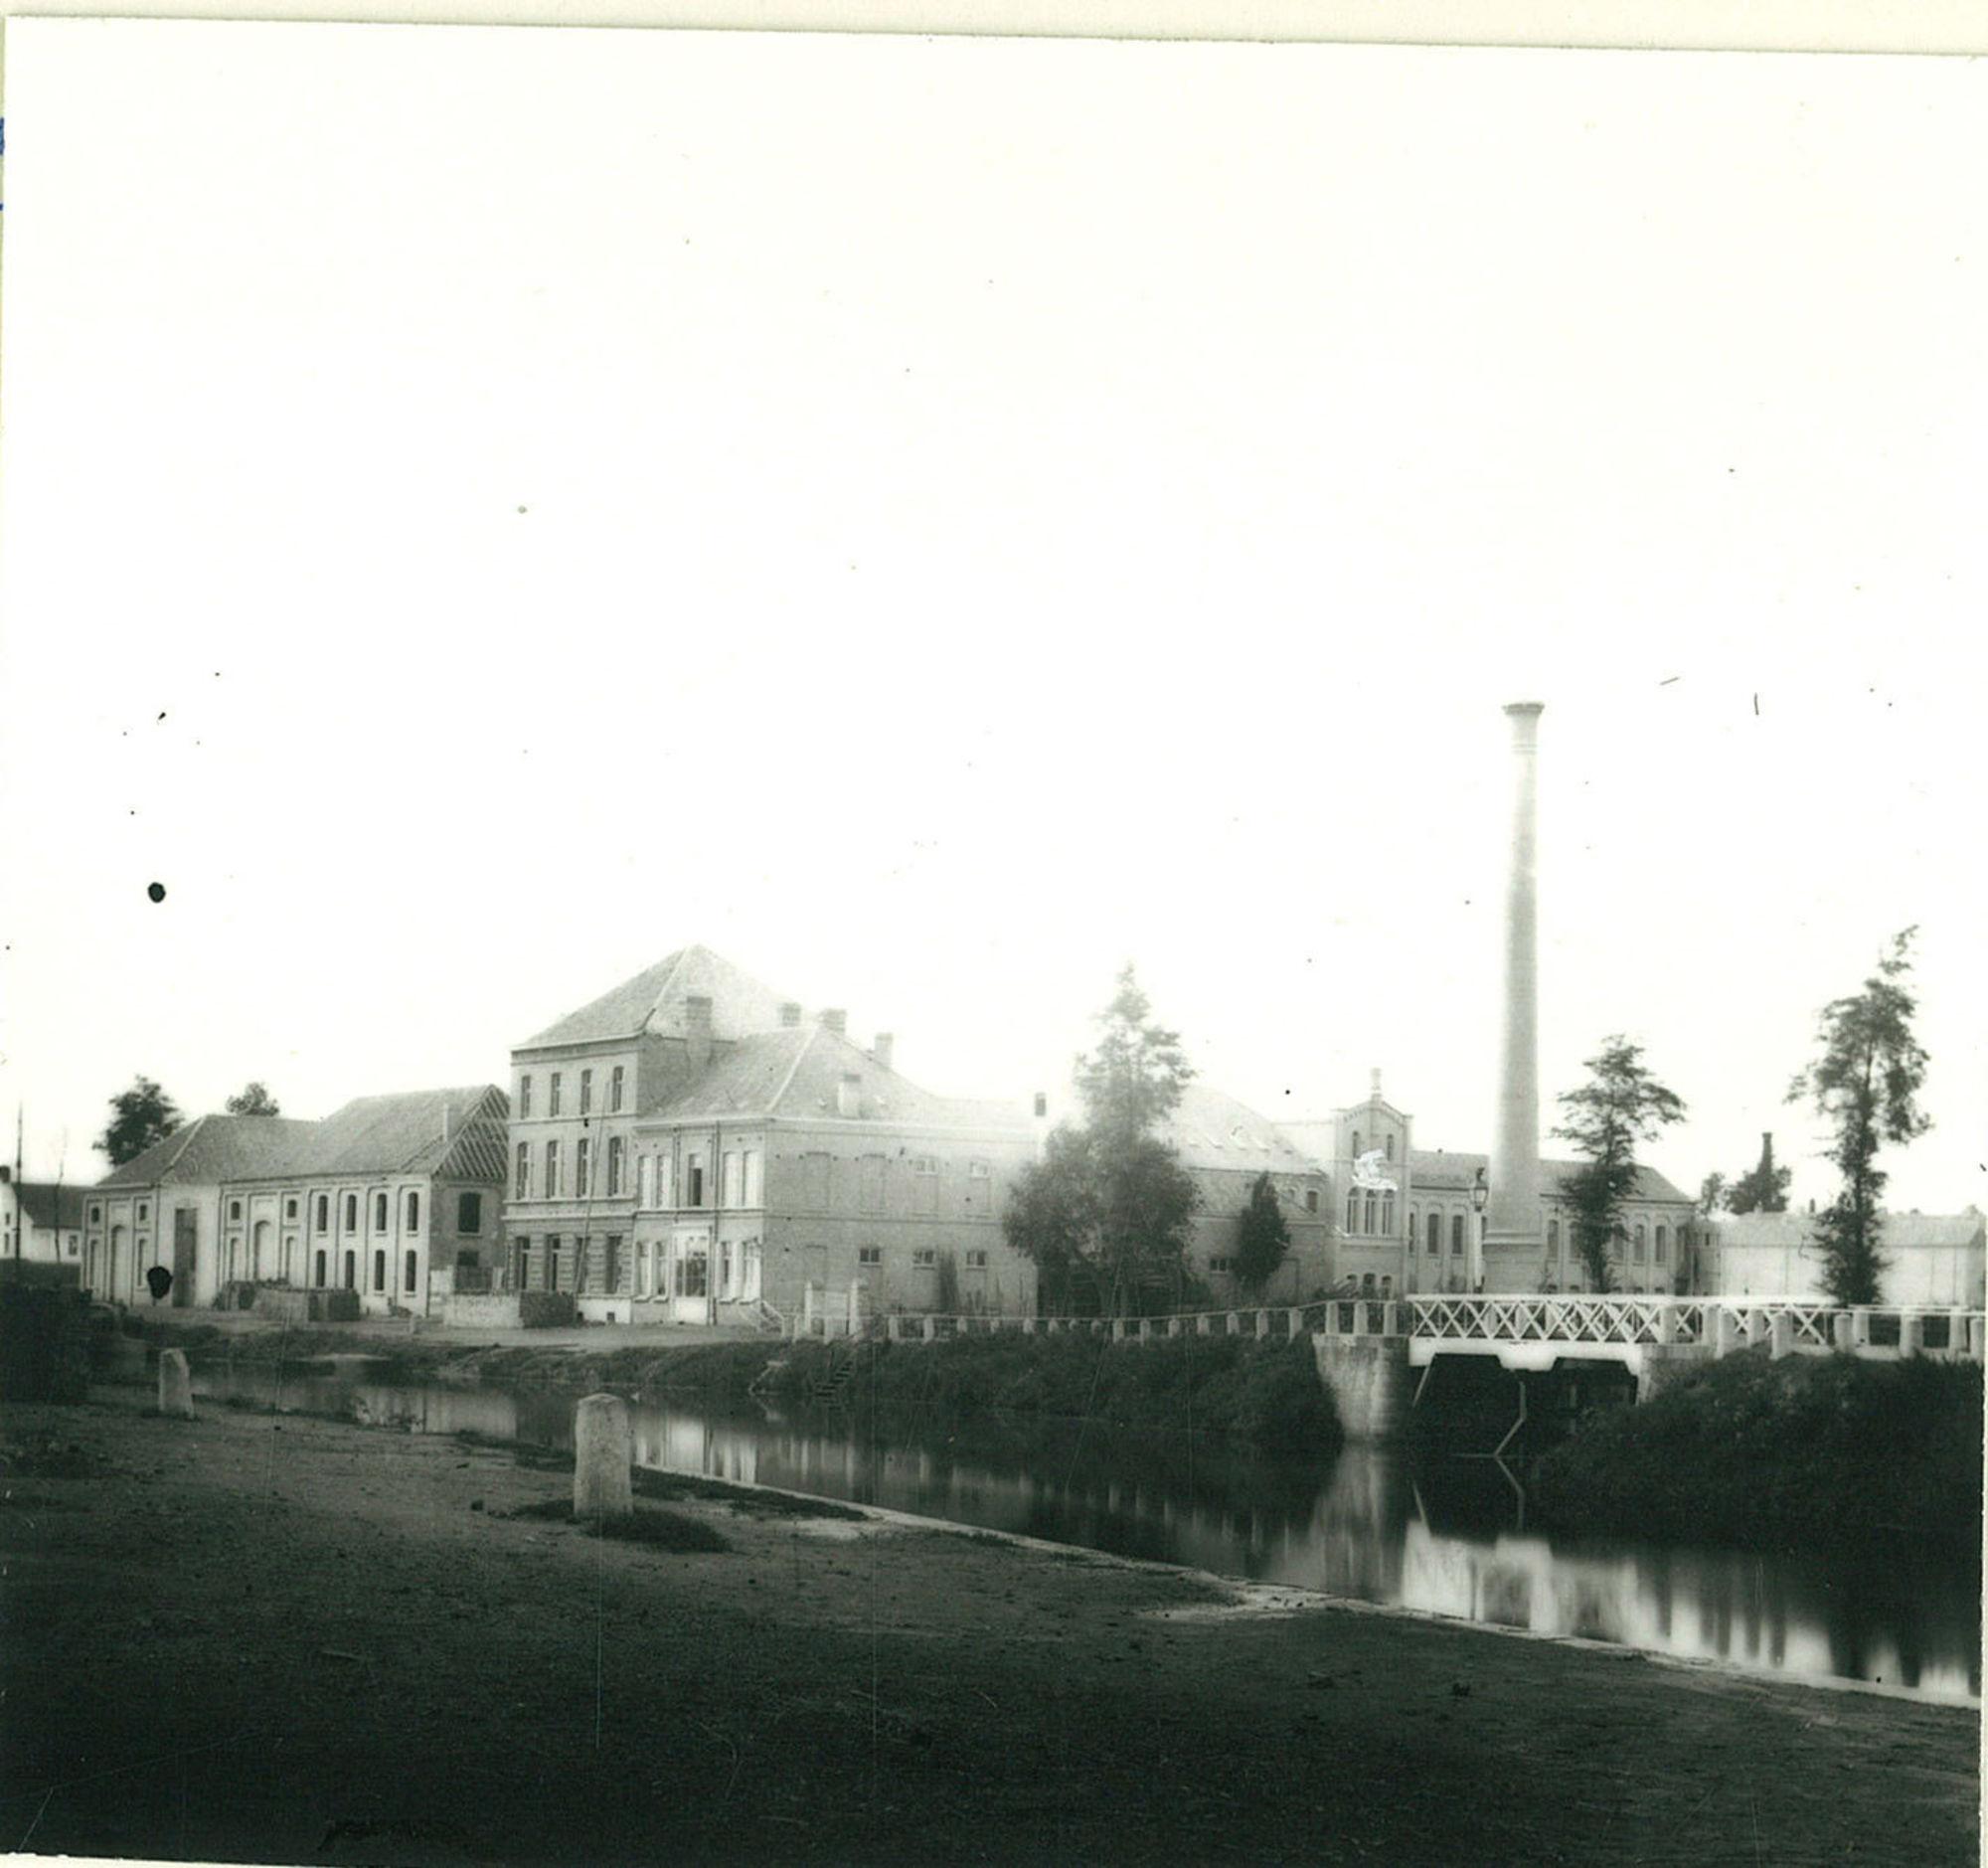 De werkhuizen Boutry-Van Ysselsteen, langs de Fabriekskaai